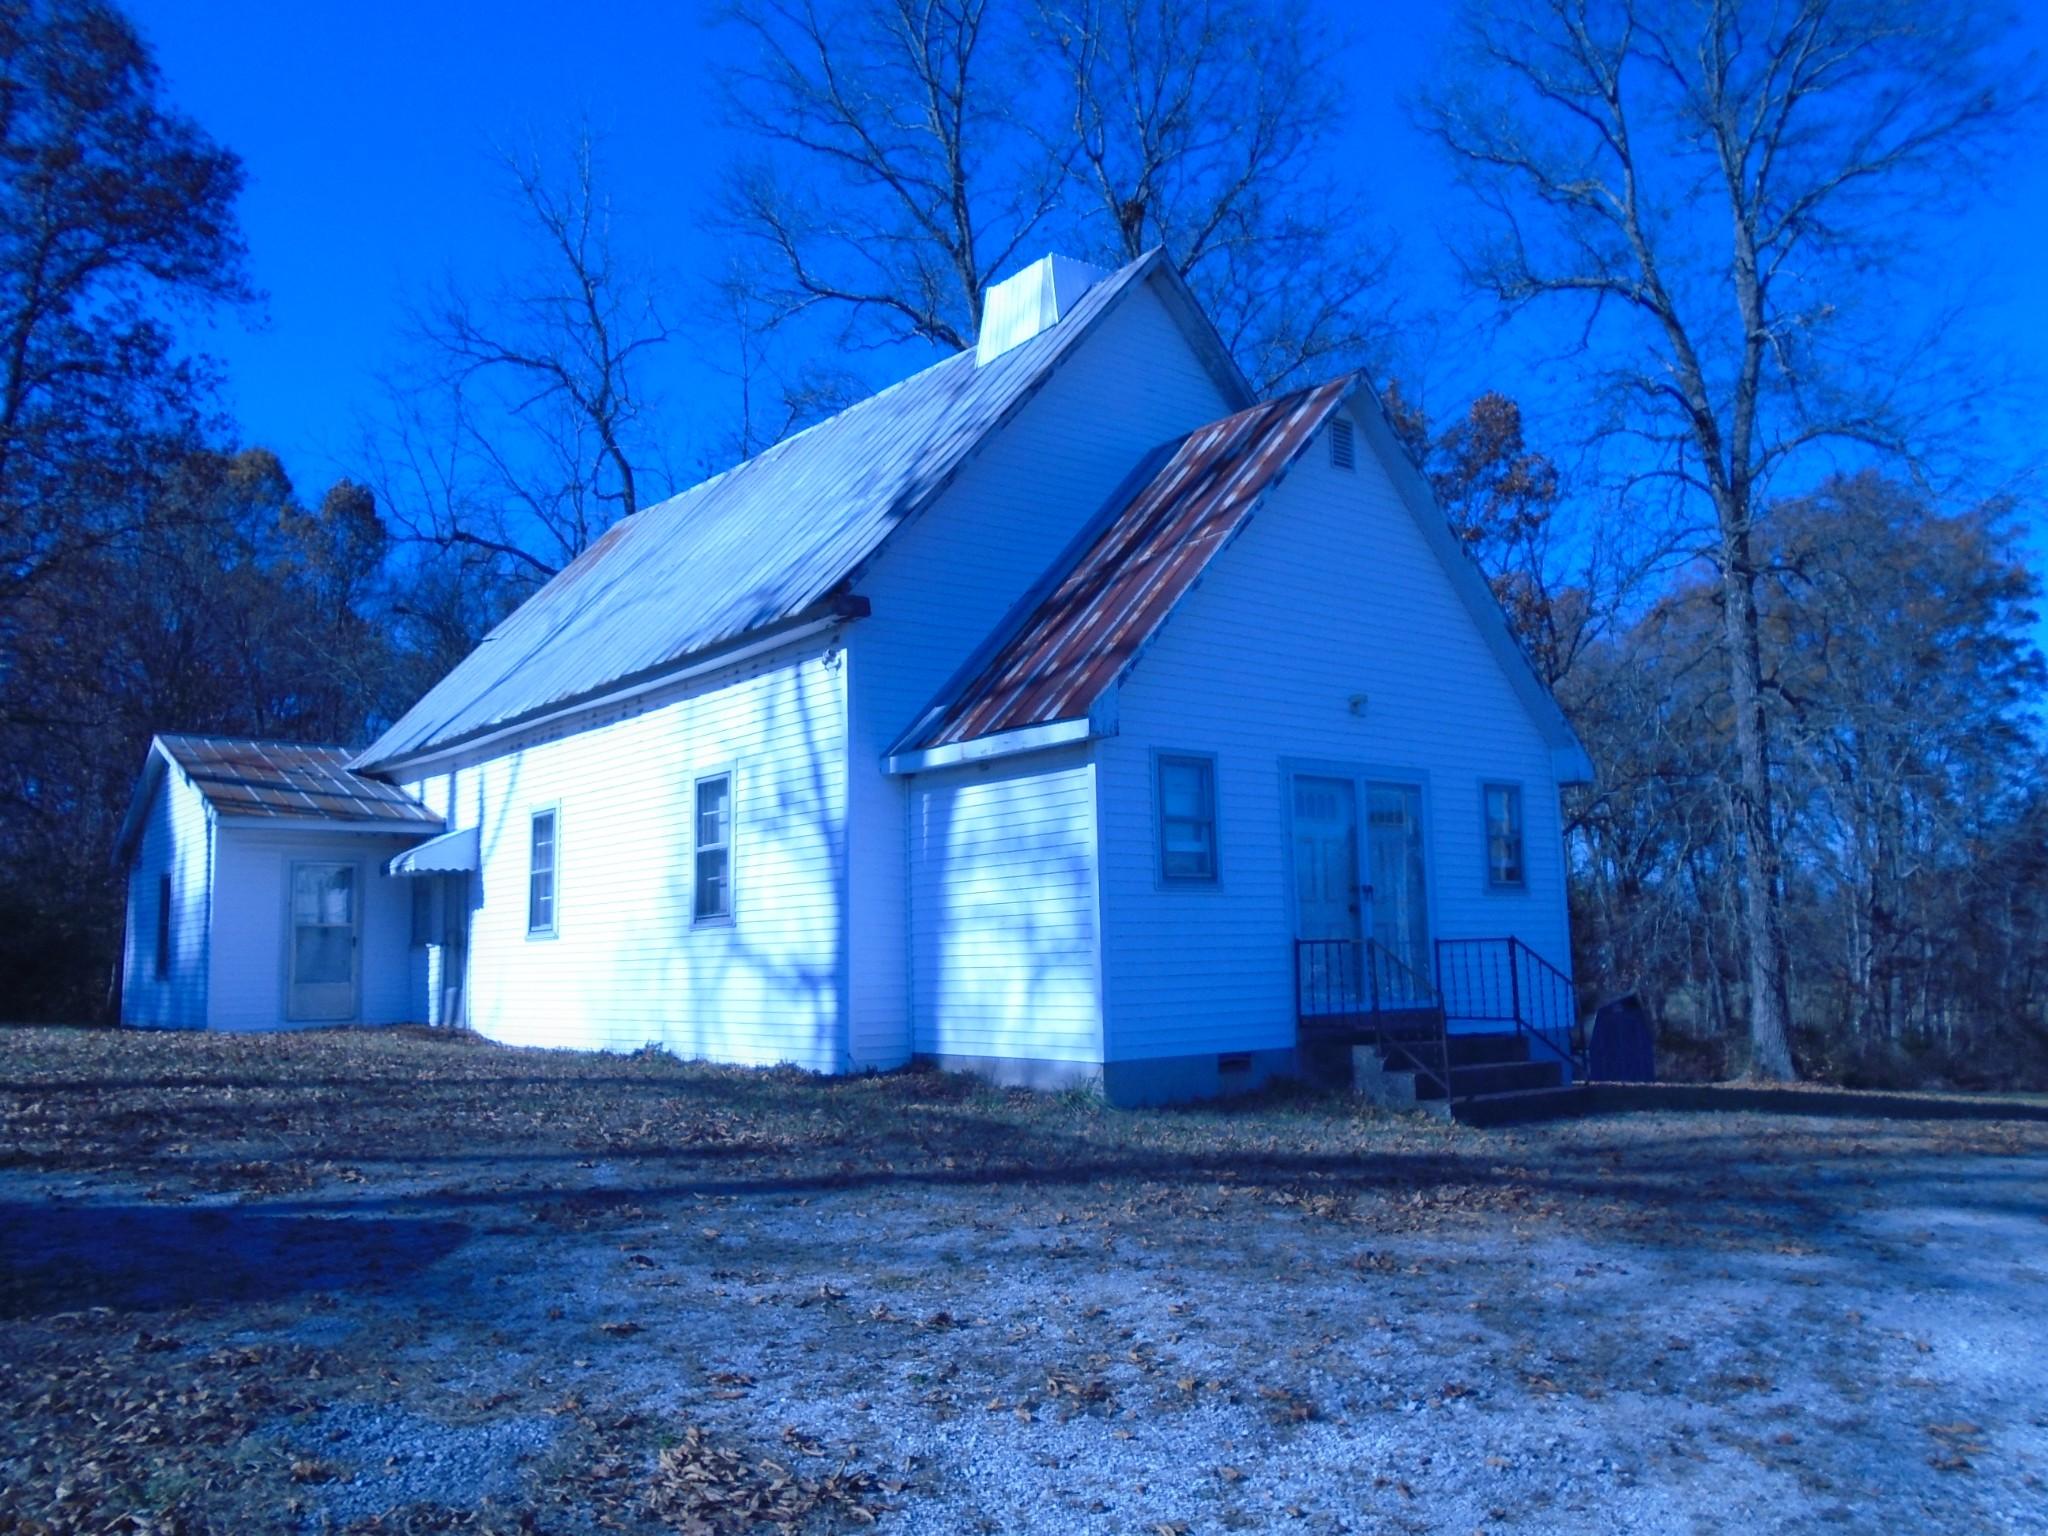 293 Mud Creek Rd, Morrison, TN 37357 - Morrison, TN real estate listing